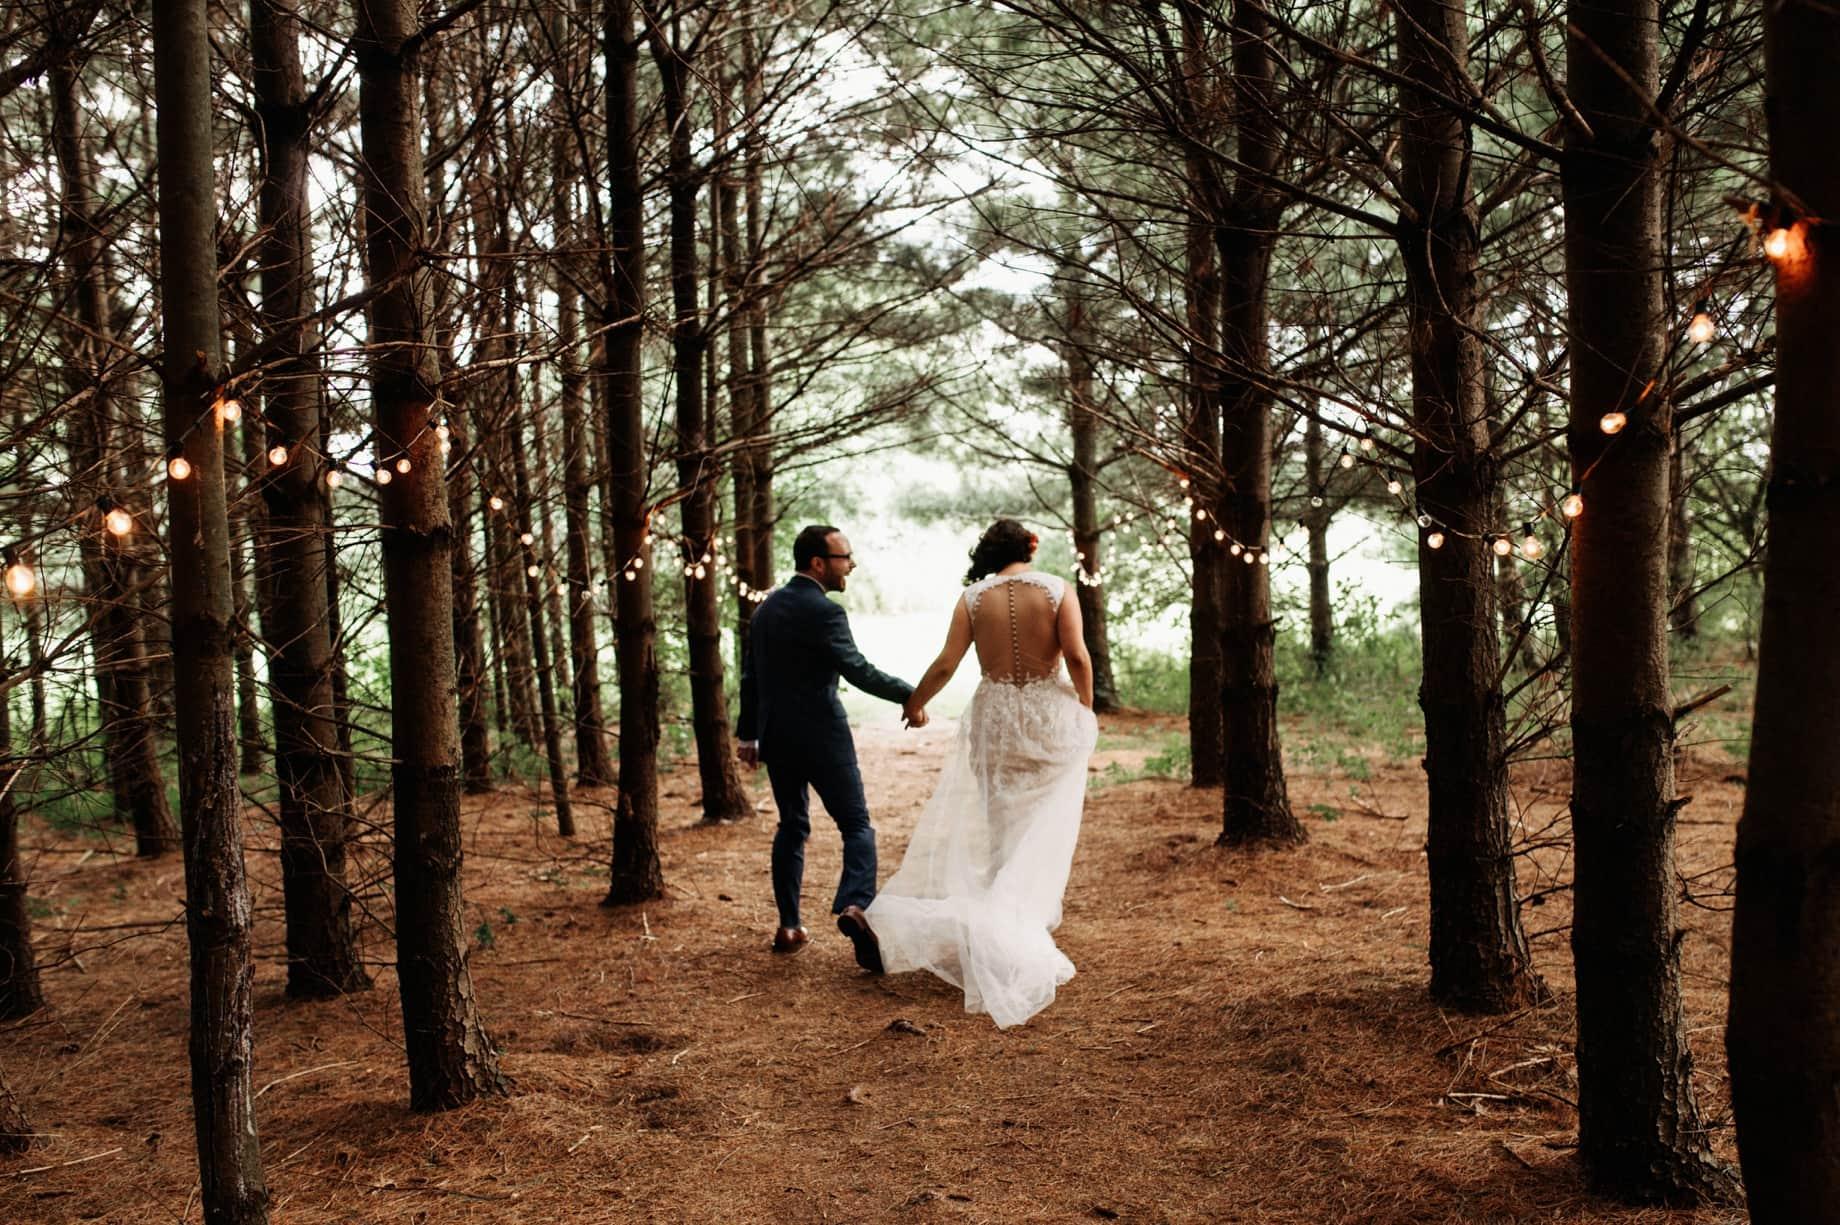 post matrimony bliss